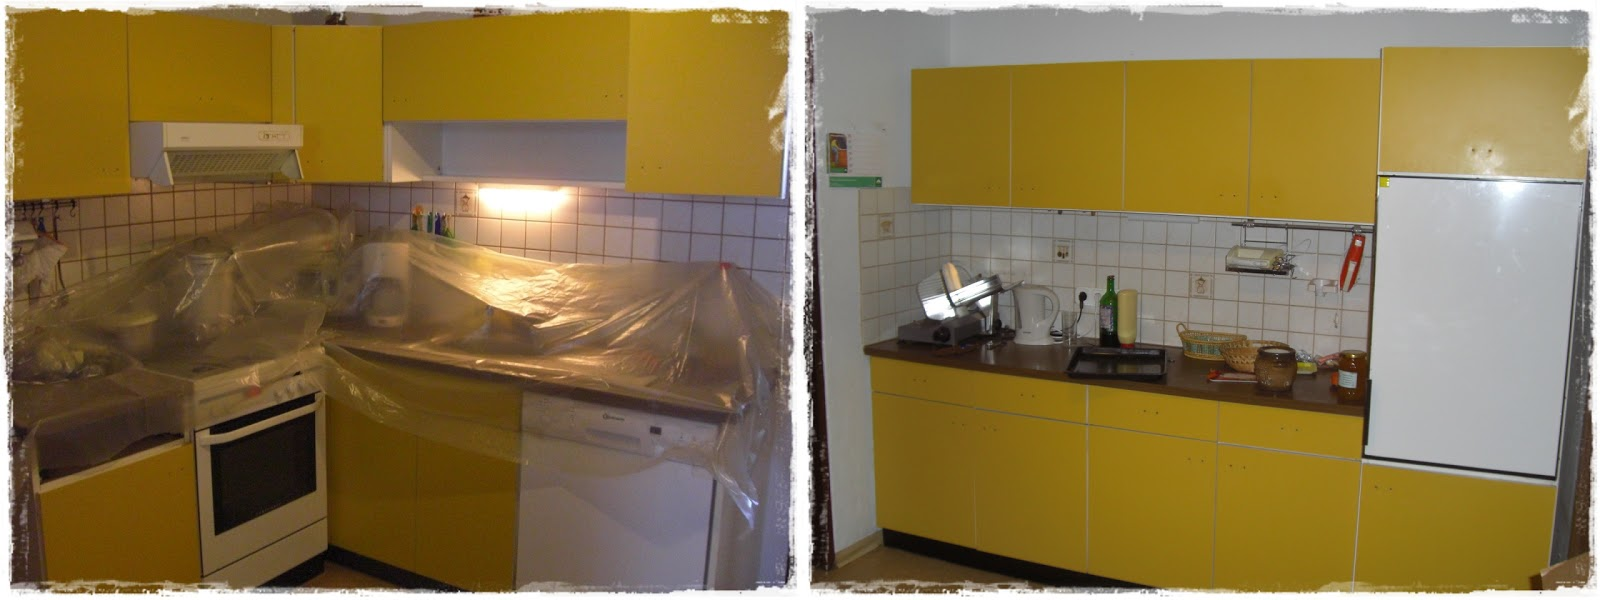 Gelbe Kuche Kuchenlampe Ikea 187524 Ruckwand Kuche Glas Luxus